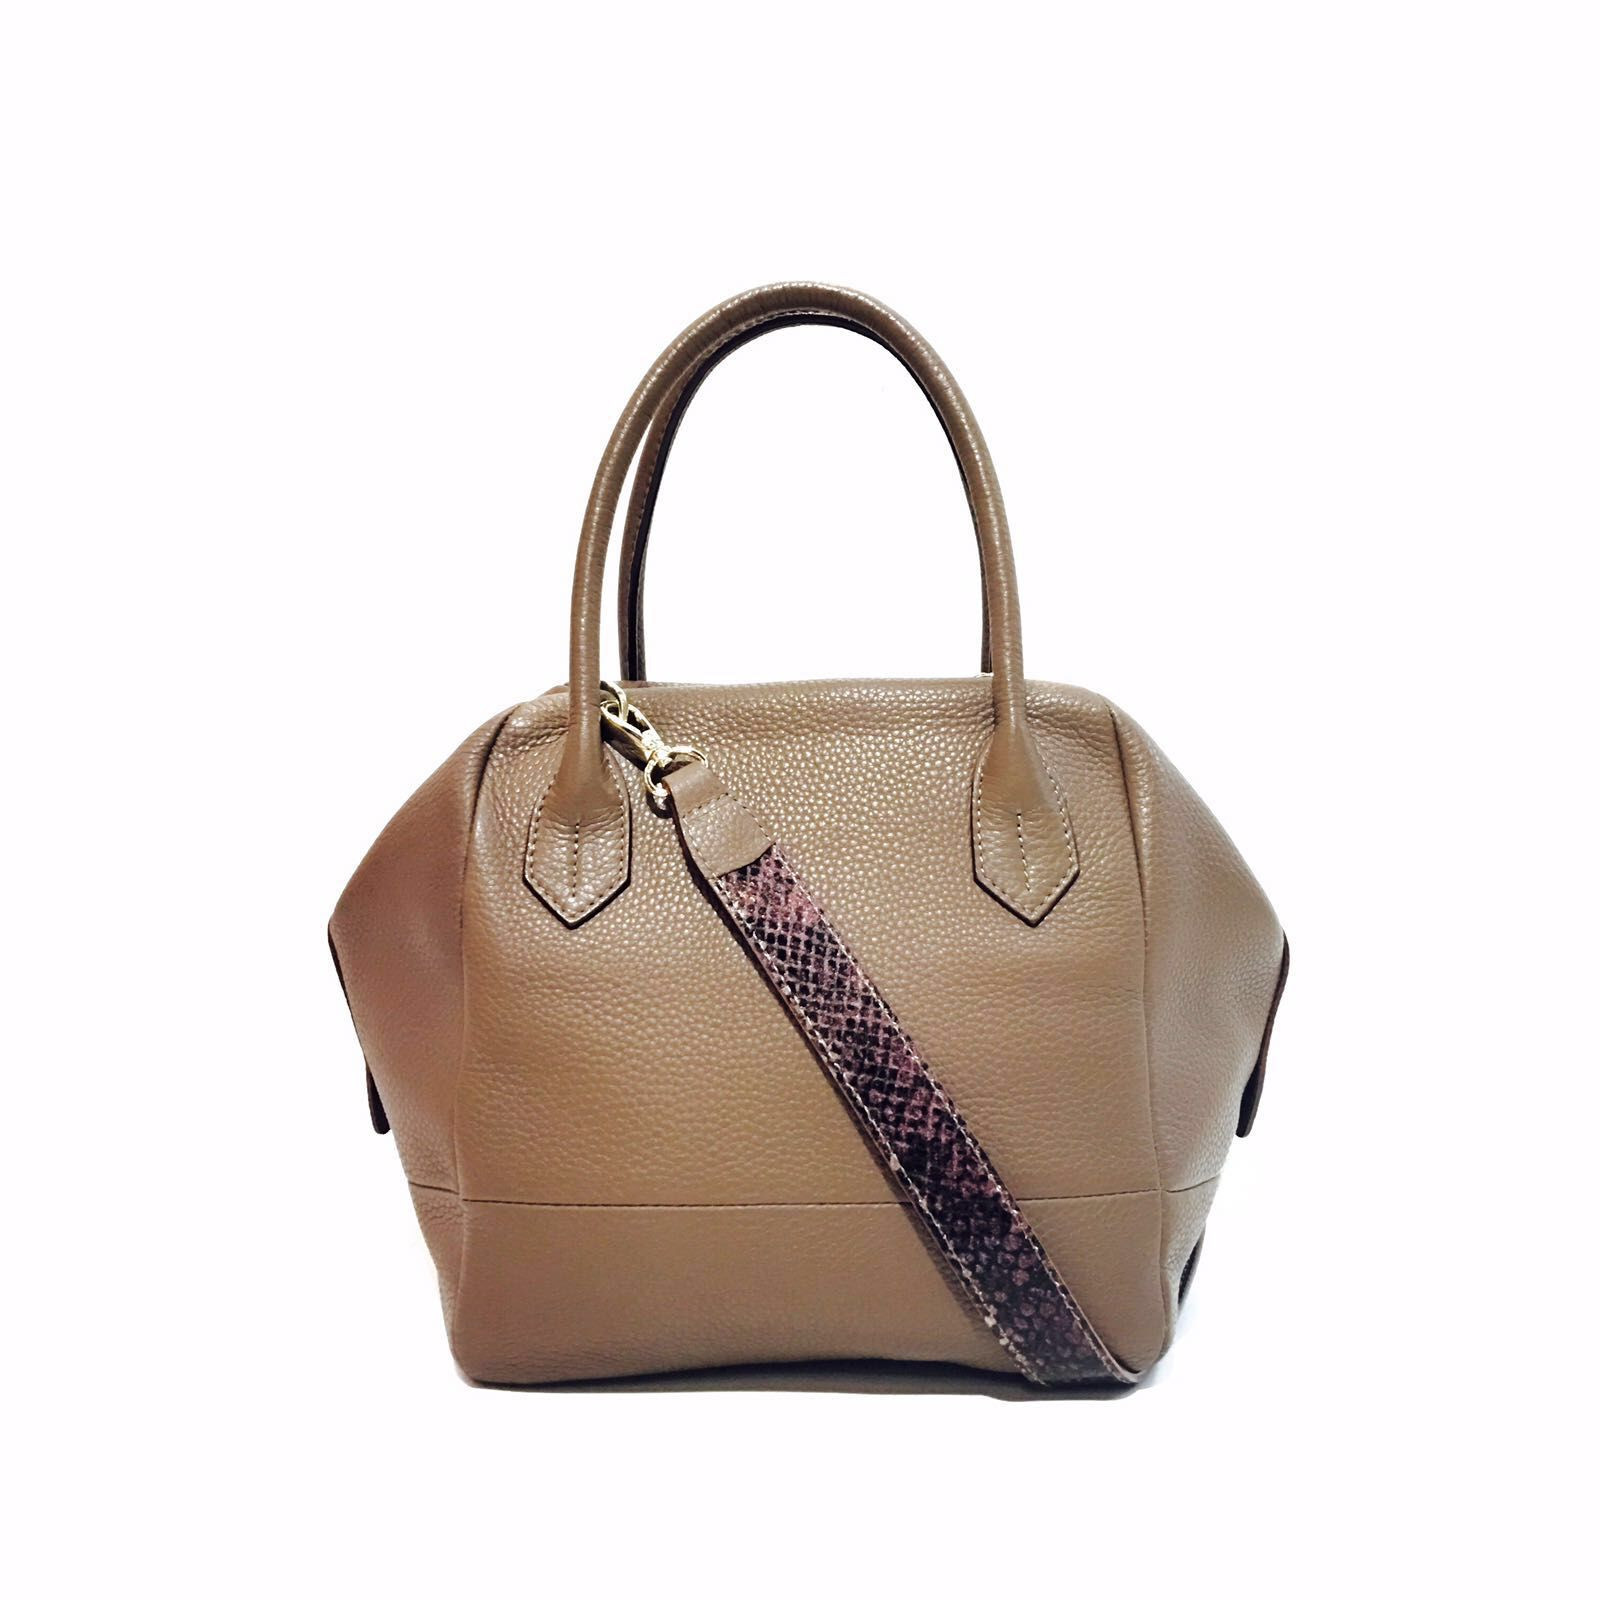 Boxy satchel